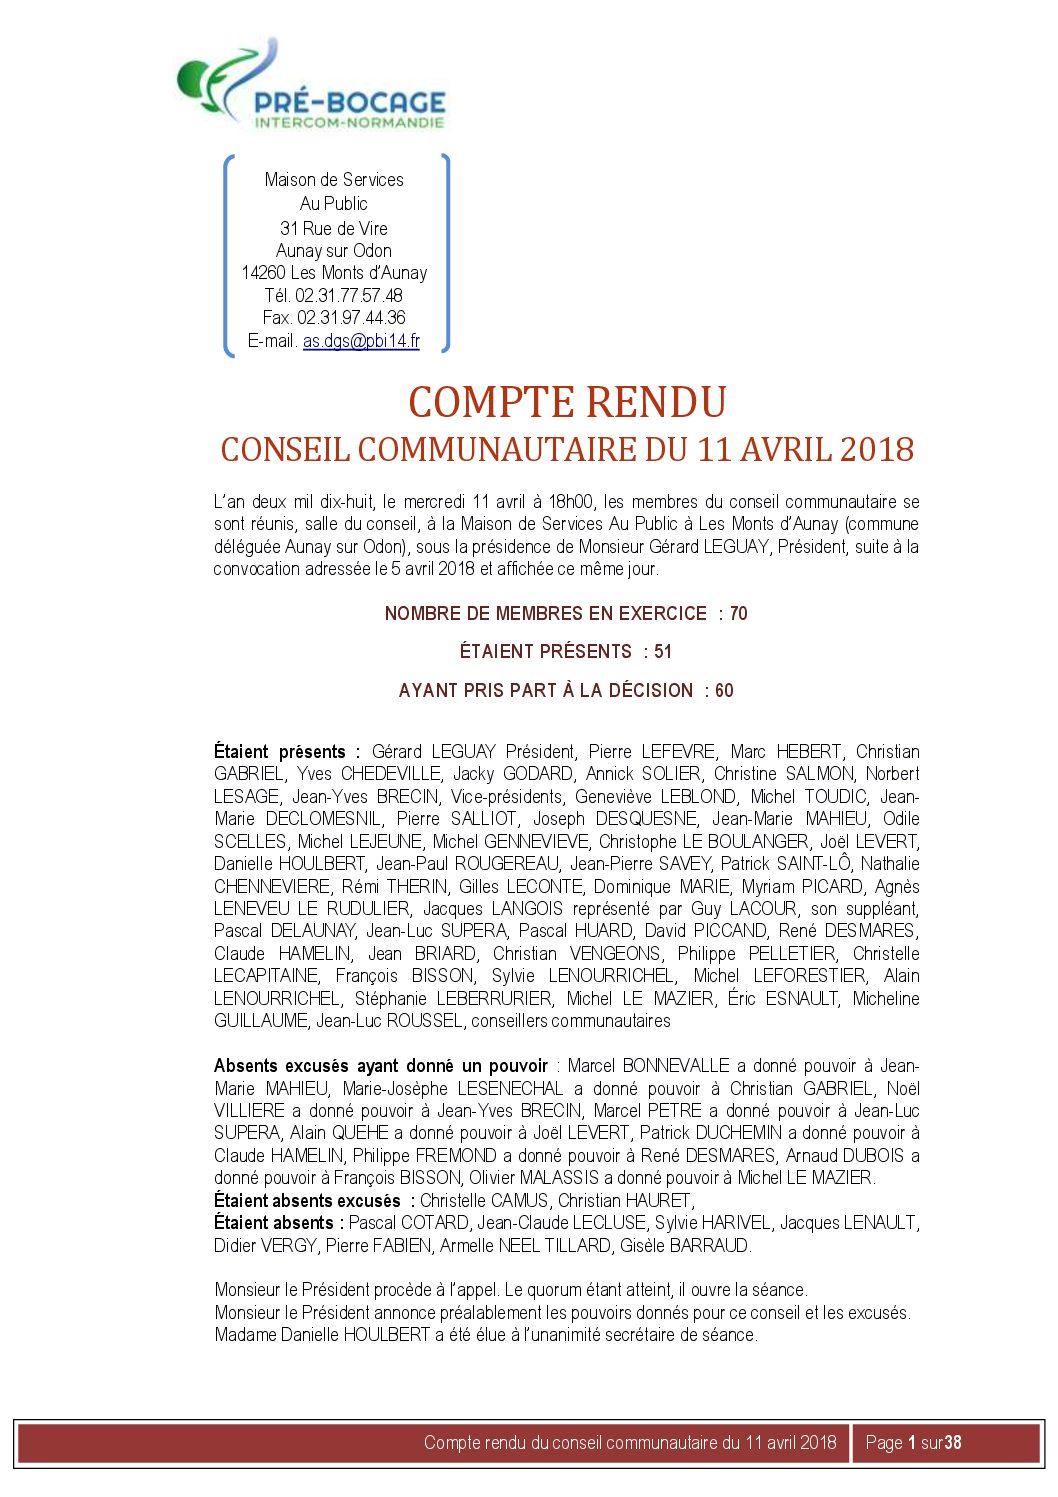 Compte-Rendu du 11 avril 2018